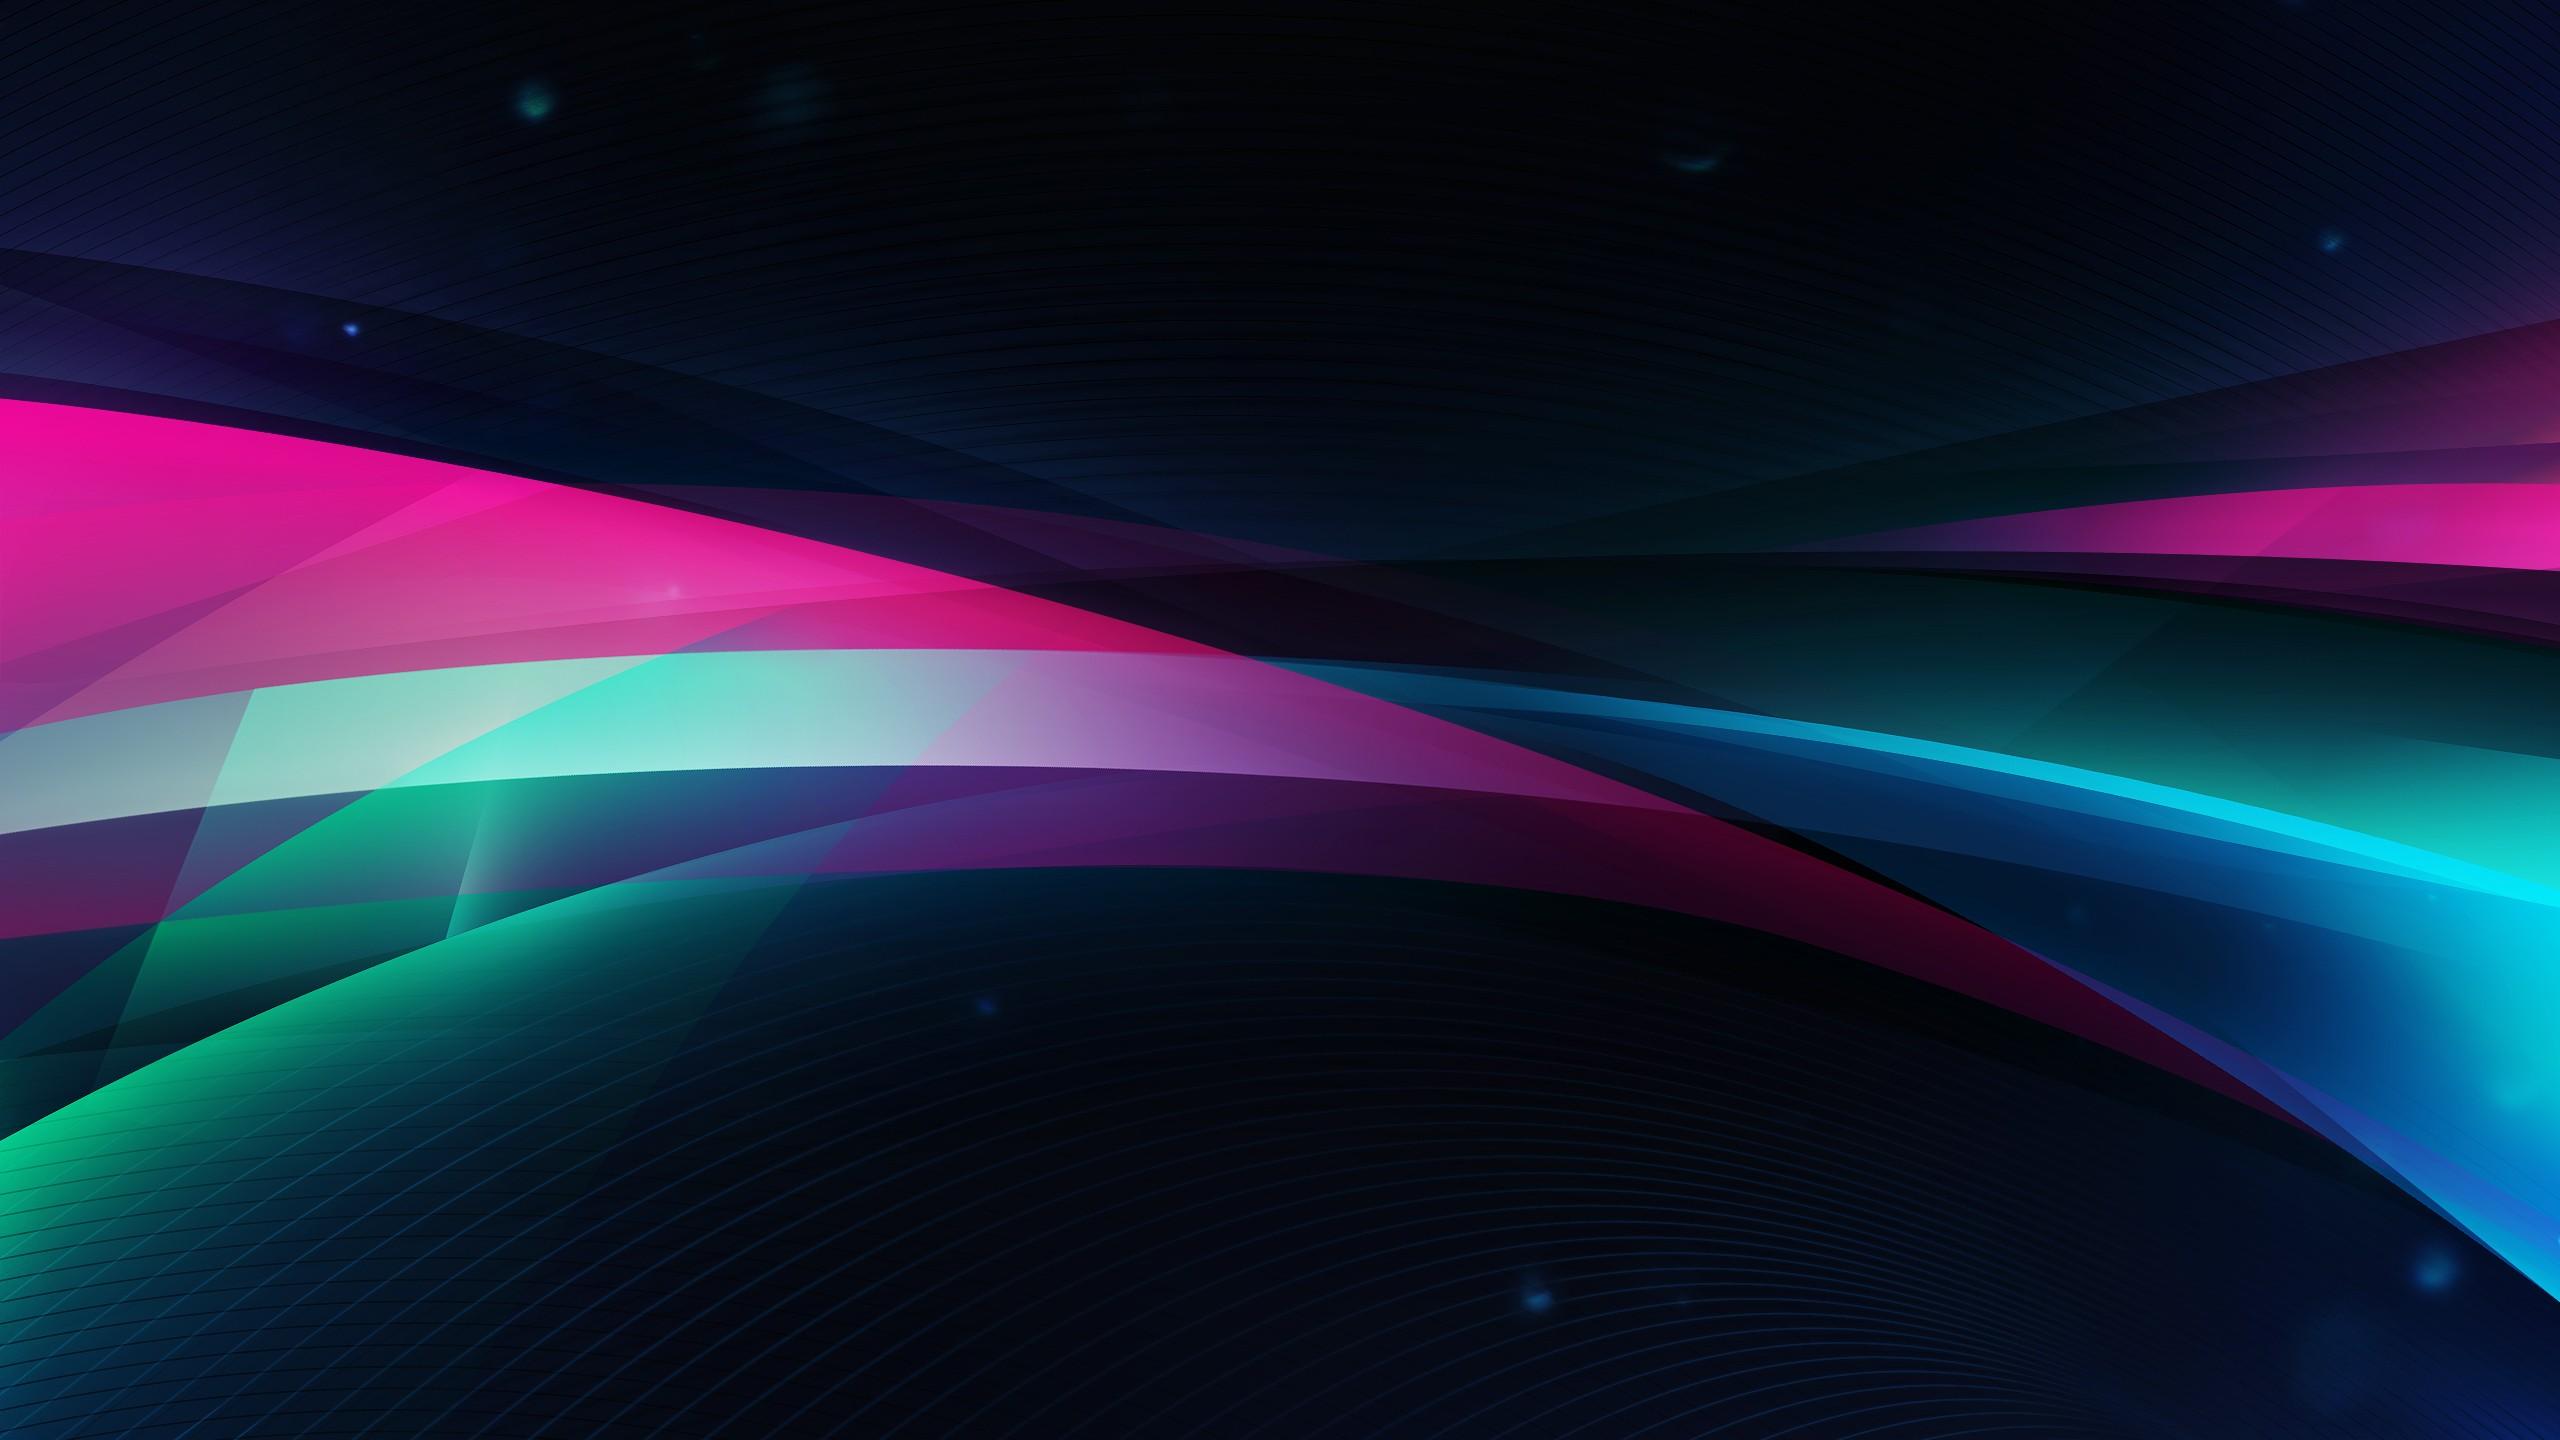 Ubuntu Full Hd , HD Wallpaper & Backgrounds